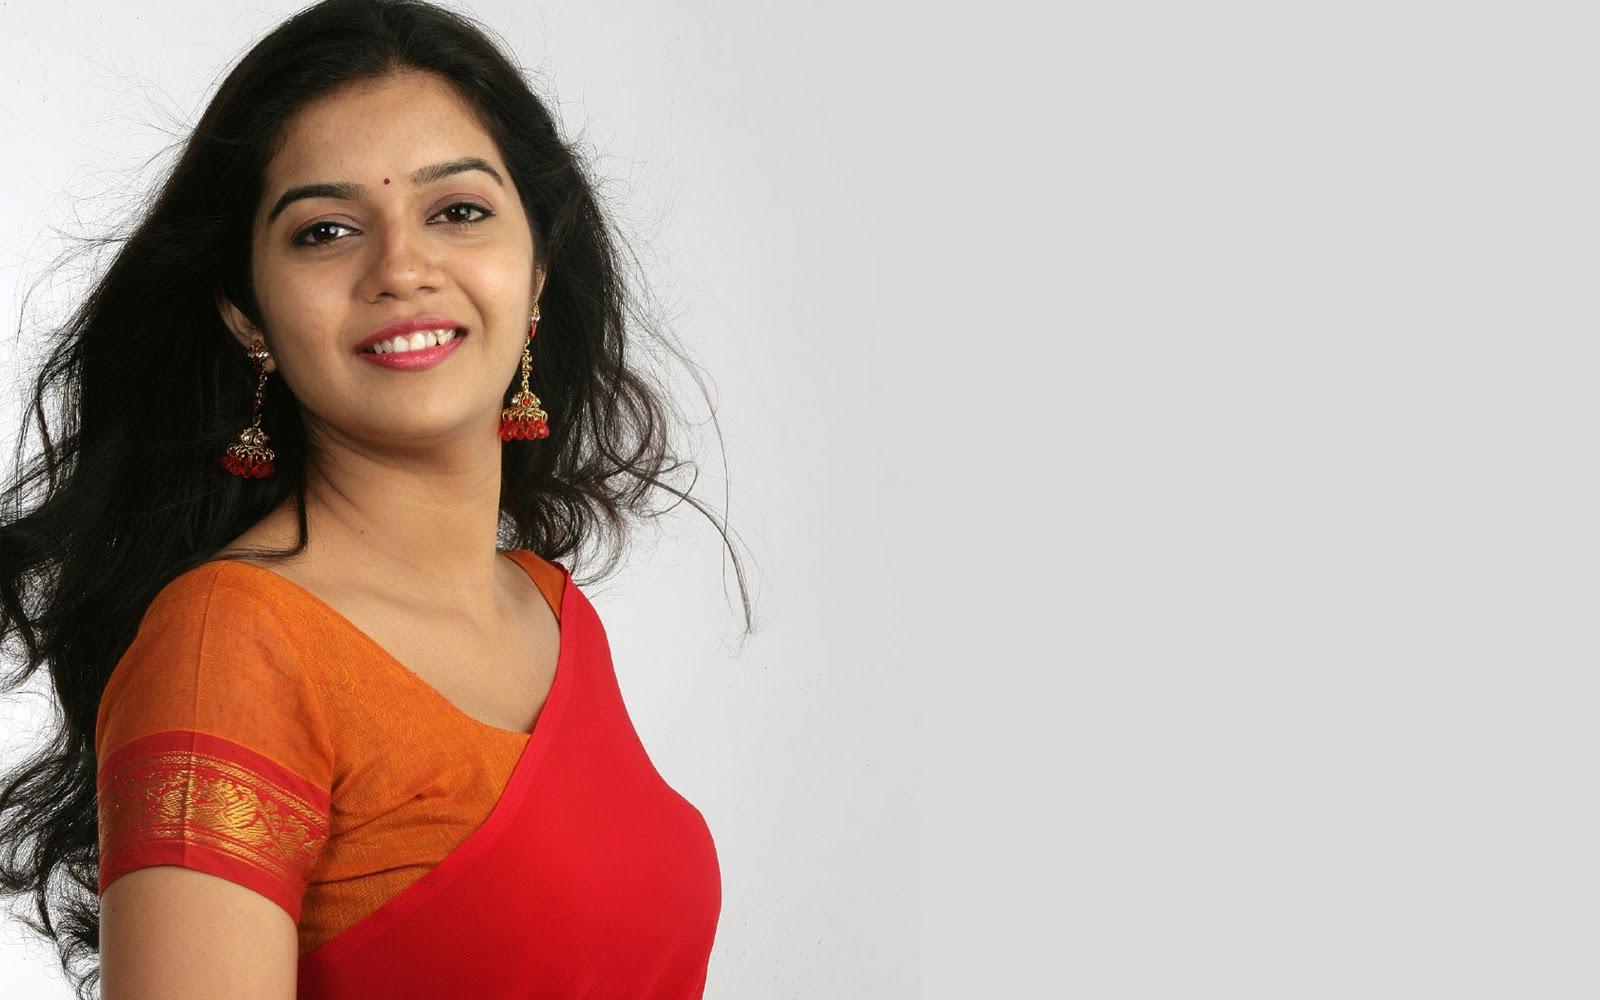 Hd wallpaper bollywood - Wallpaperzhigh Bollywood Actress Hd Wallpapers